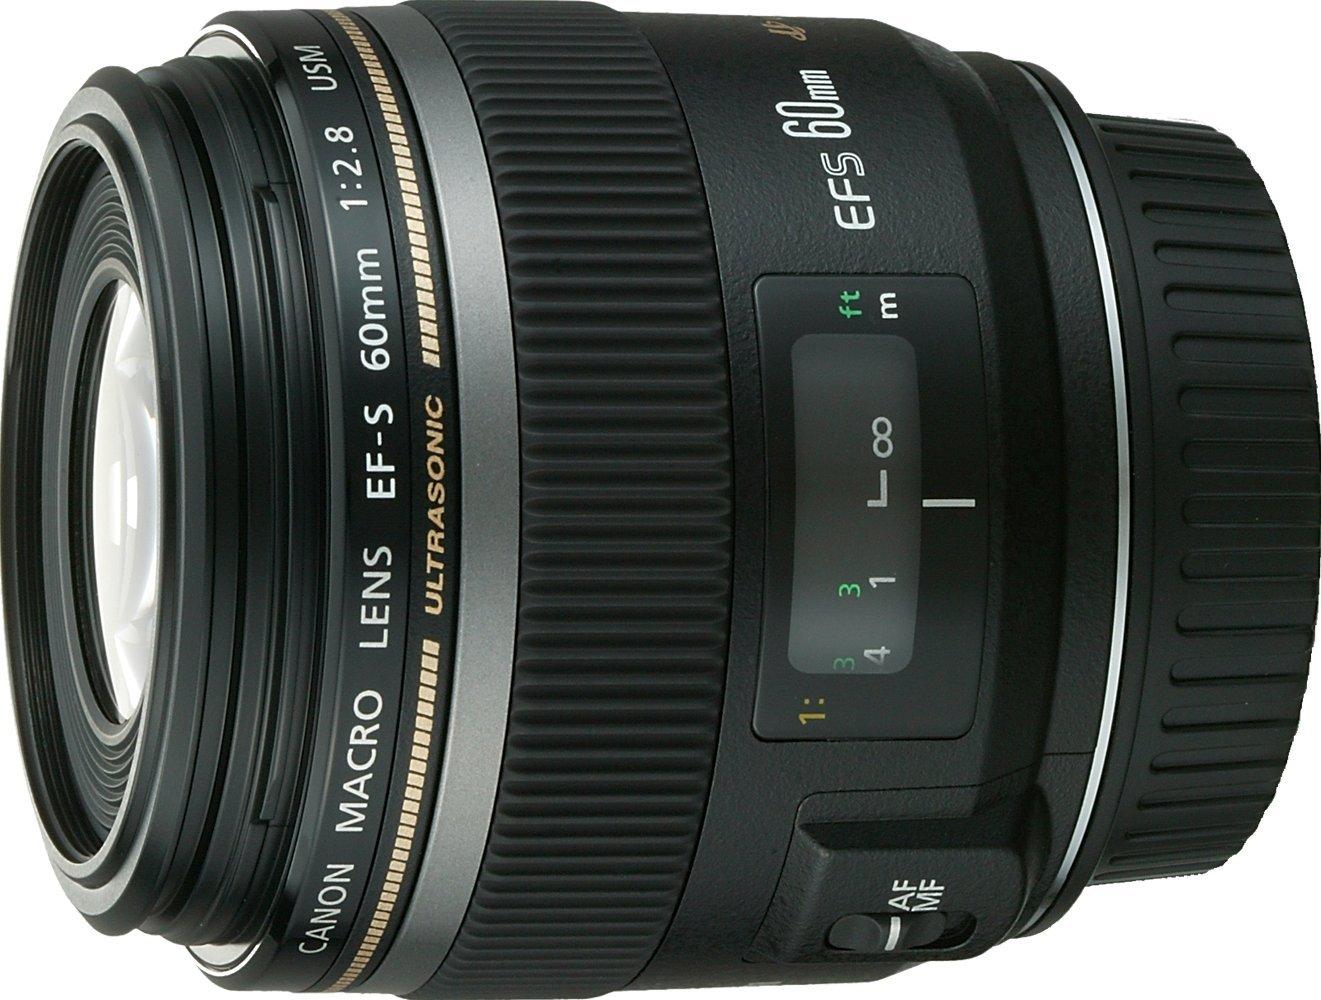 Canon EF-S 60mm f/2.8 USM Macro Lens - non Image: Amazon.co.uk ...